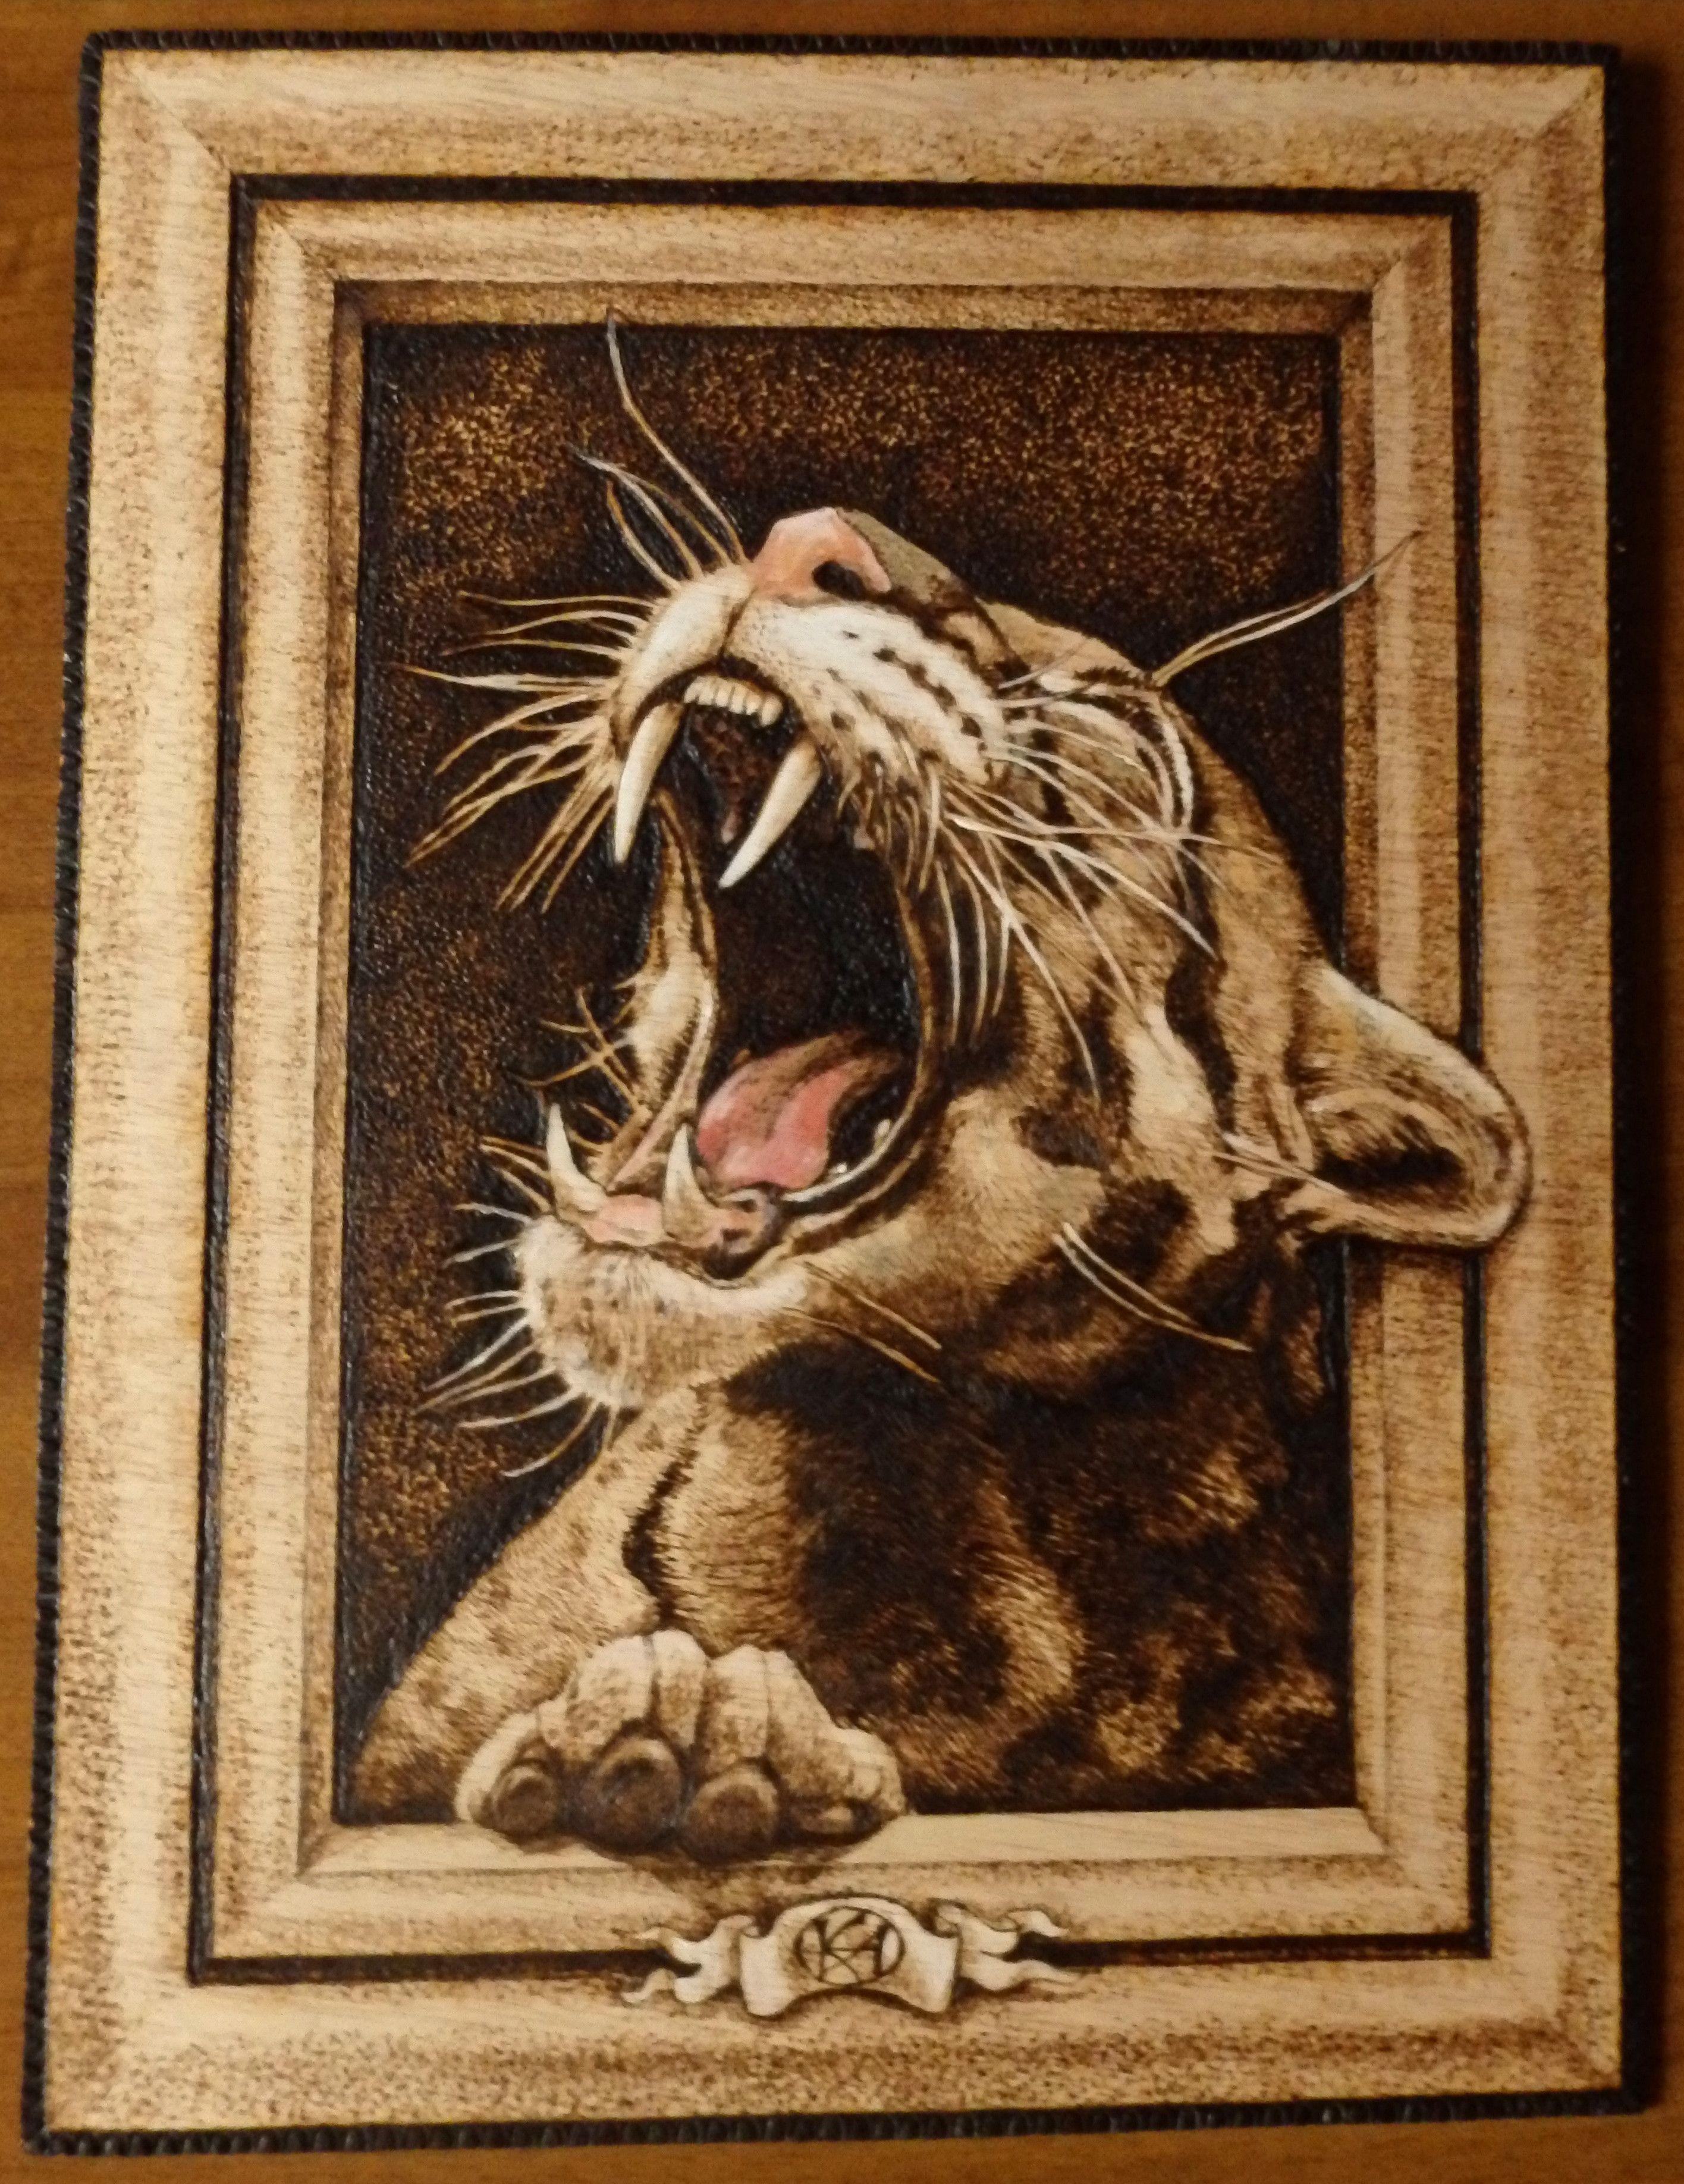 Felino Nel Quadro Pirografia Brandmalerei Malerei Holzarbeiten